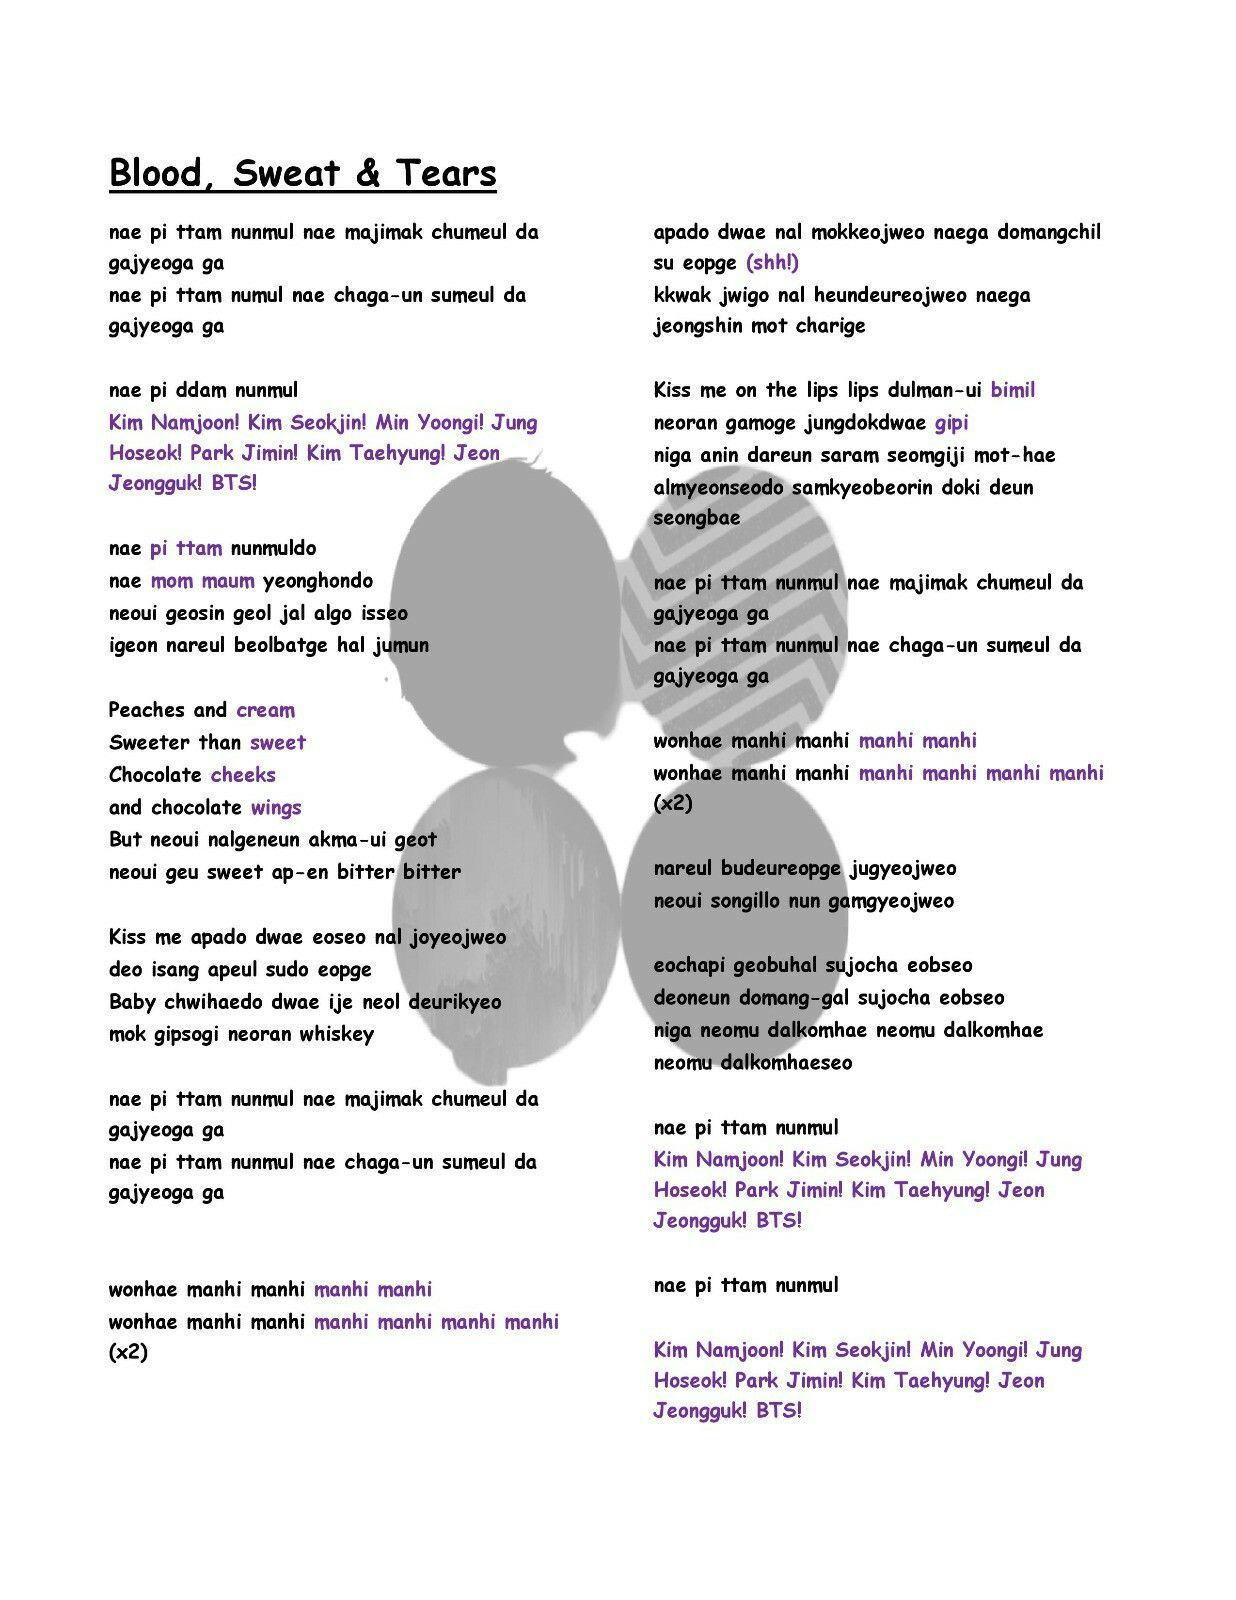 BTS Blood, Sweat & Tears English Translation Lyrics